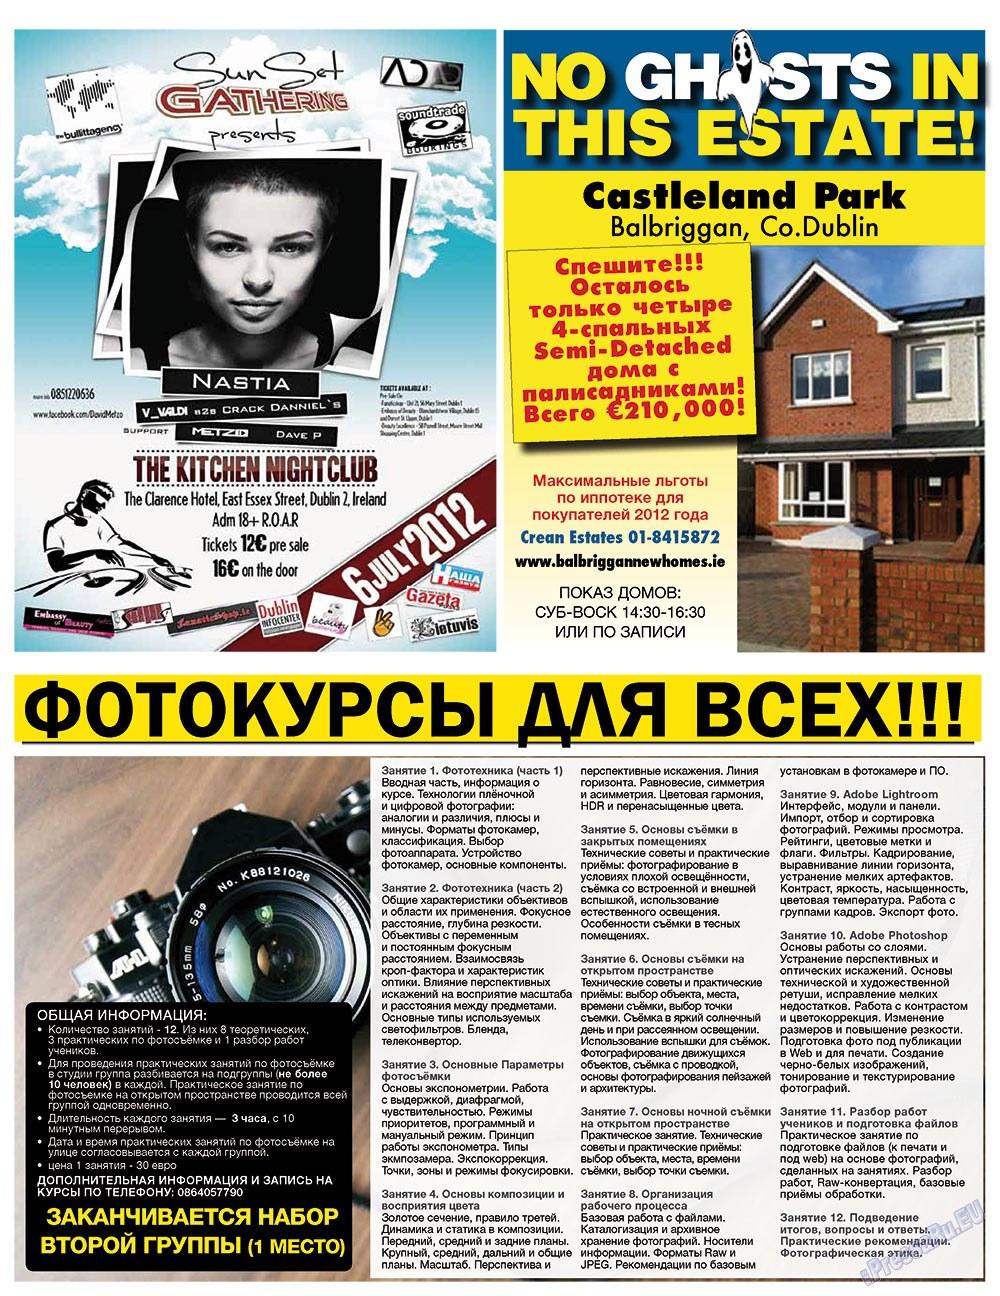 Дублин инфоцентр (газета). 2012 год, номер 25, стр. 16